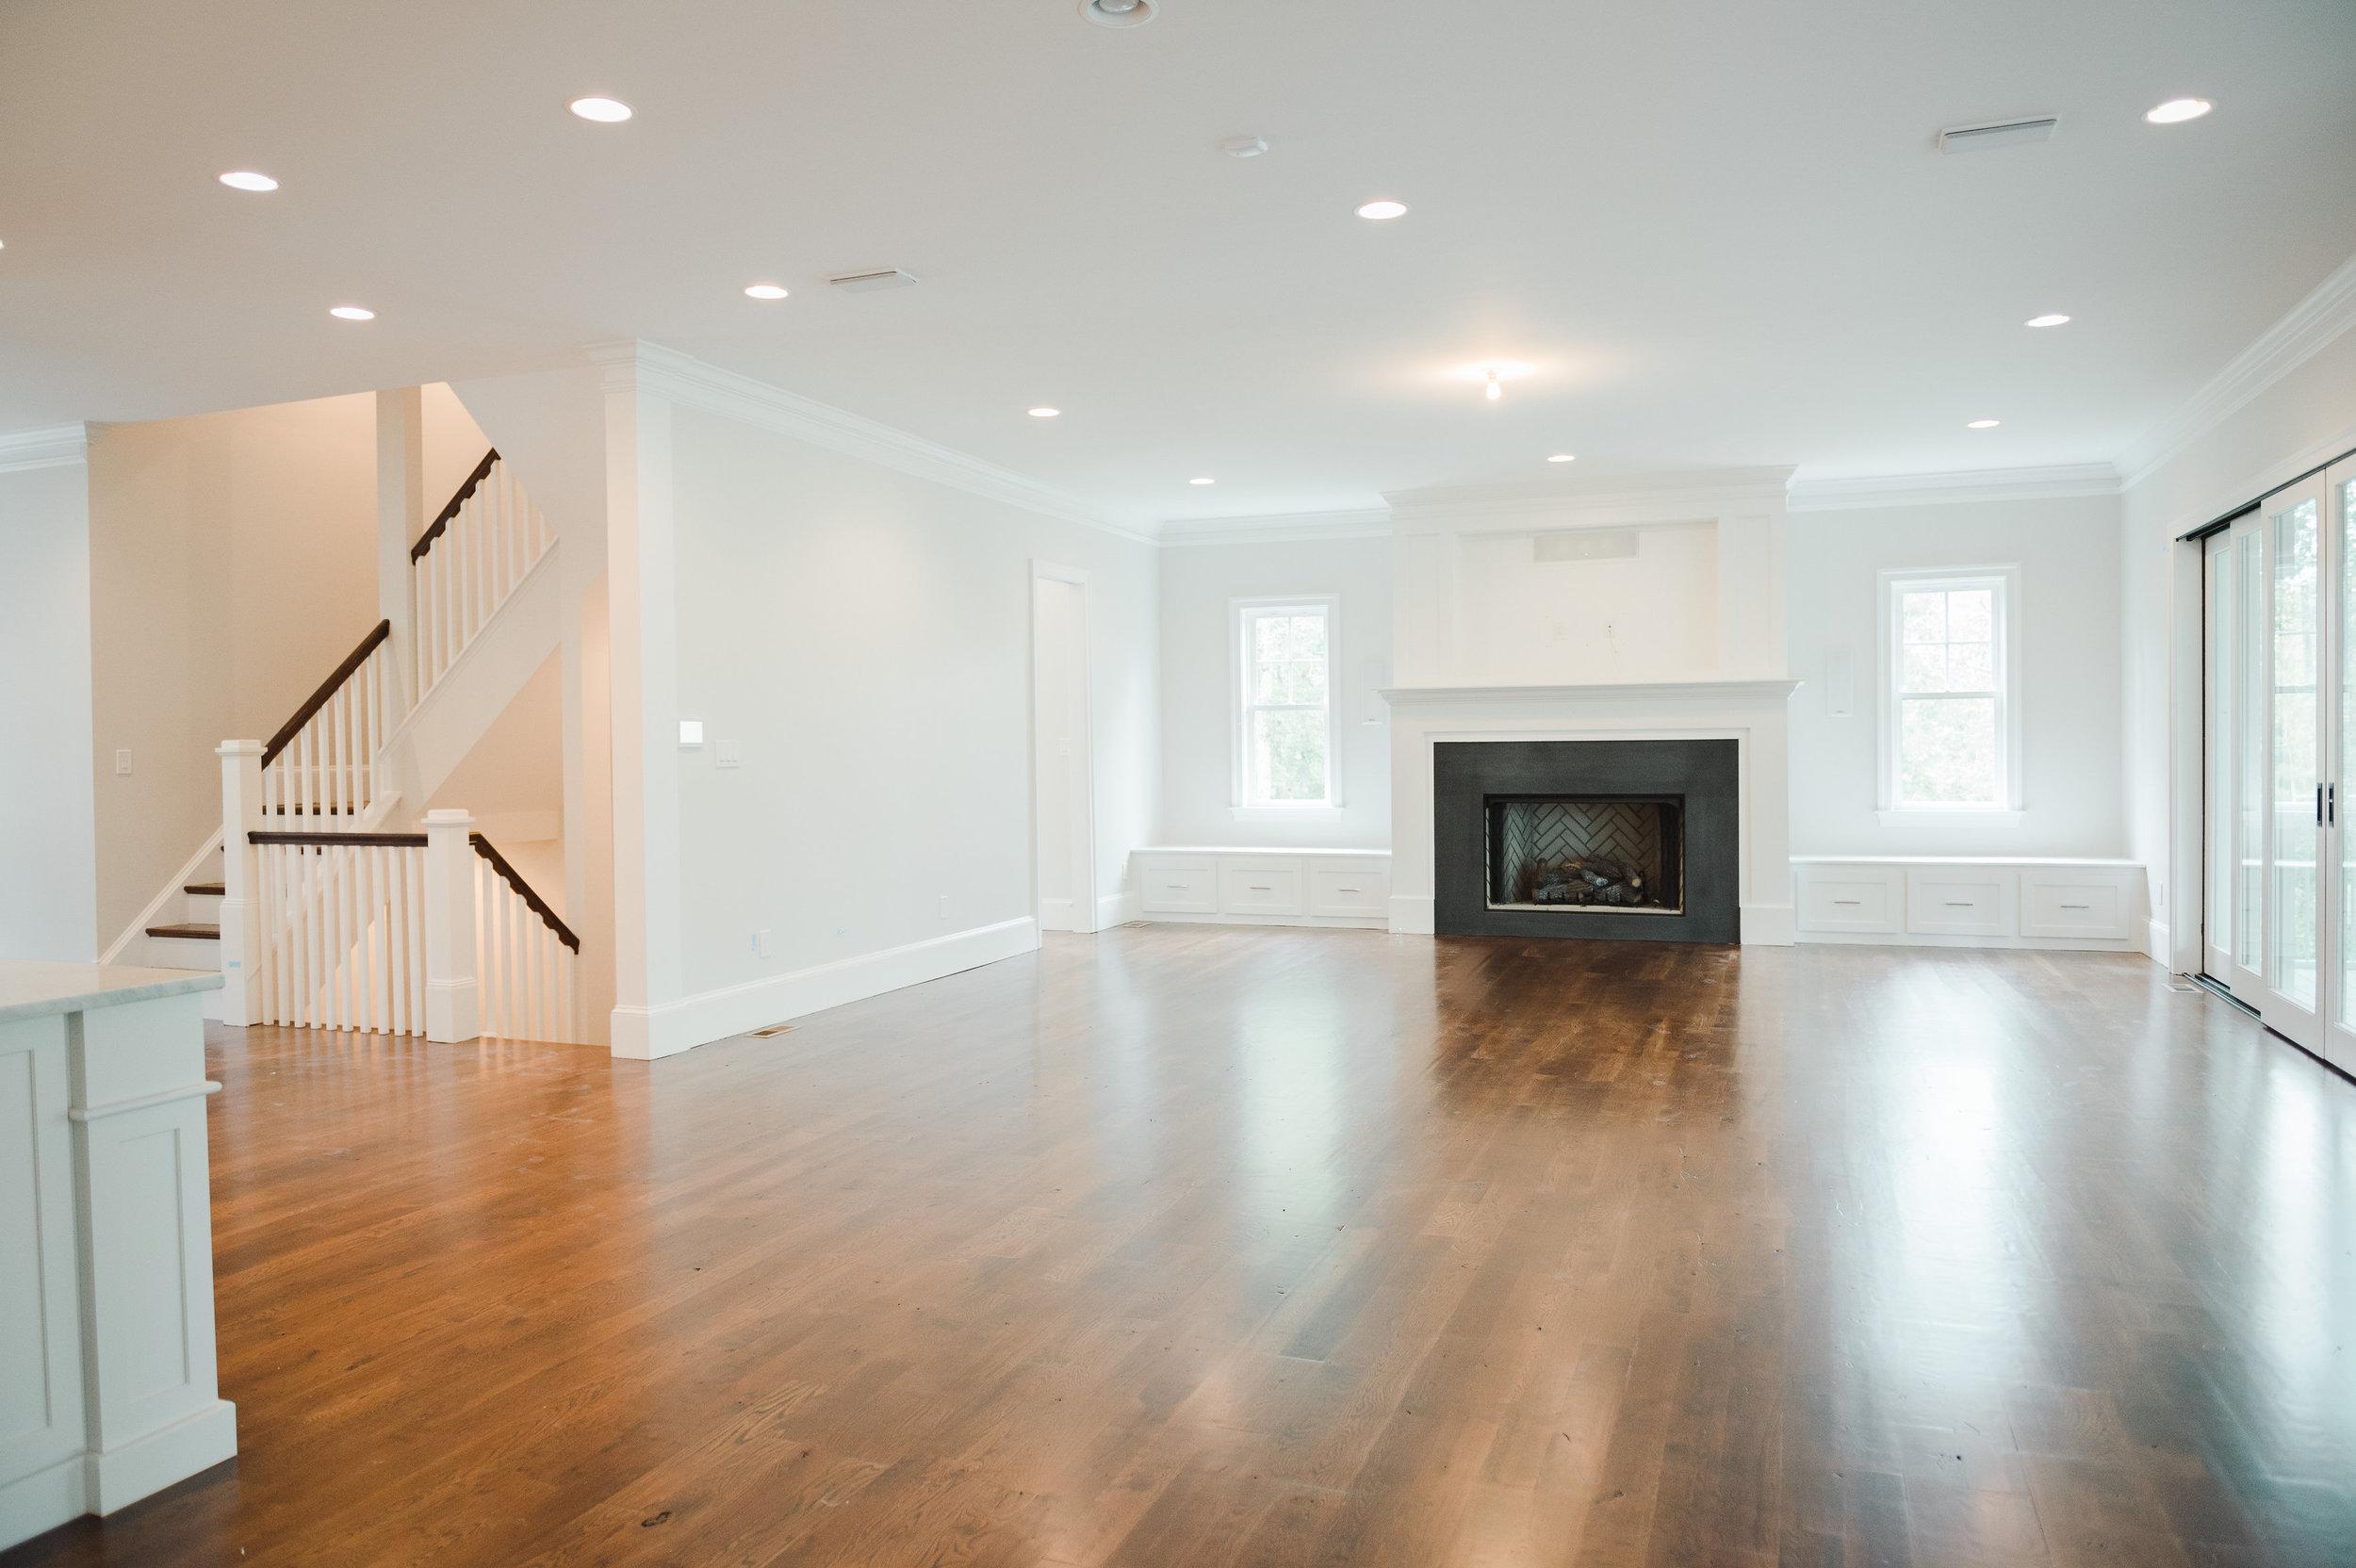 Fireplace design, window seat, and medium hardwood floors || Studio McGee